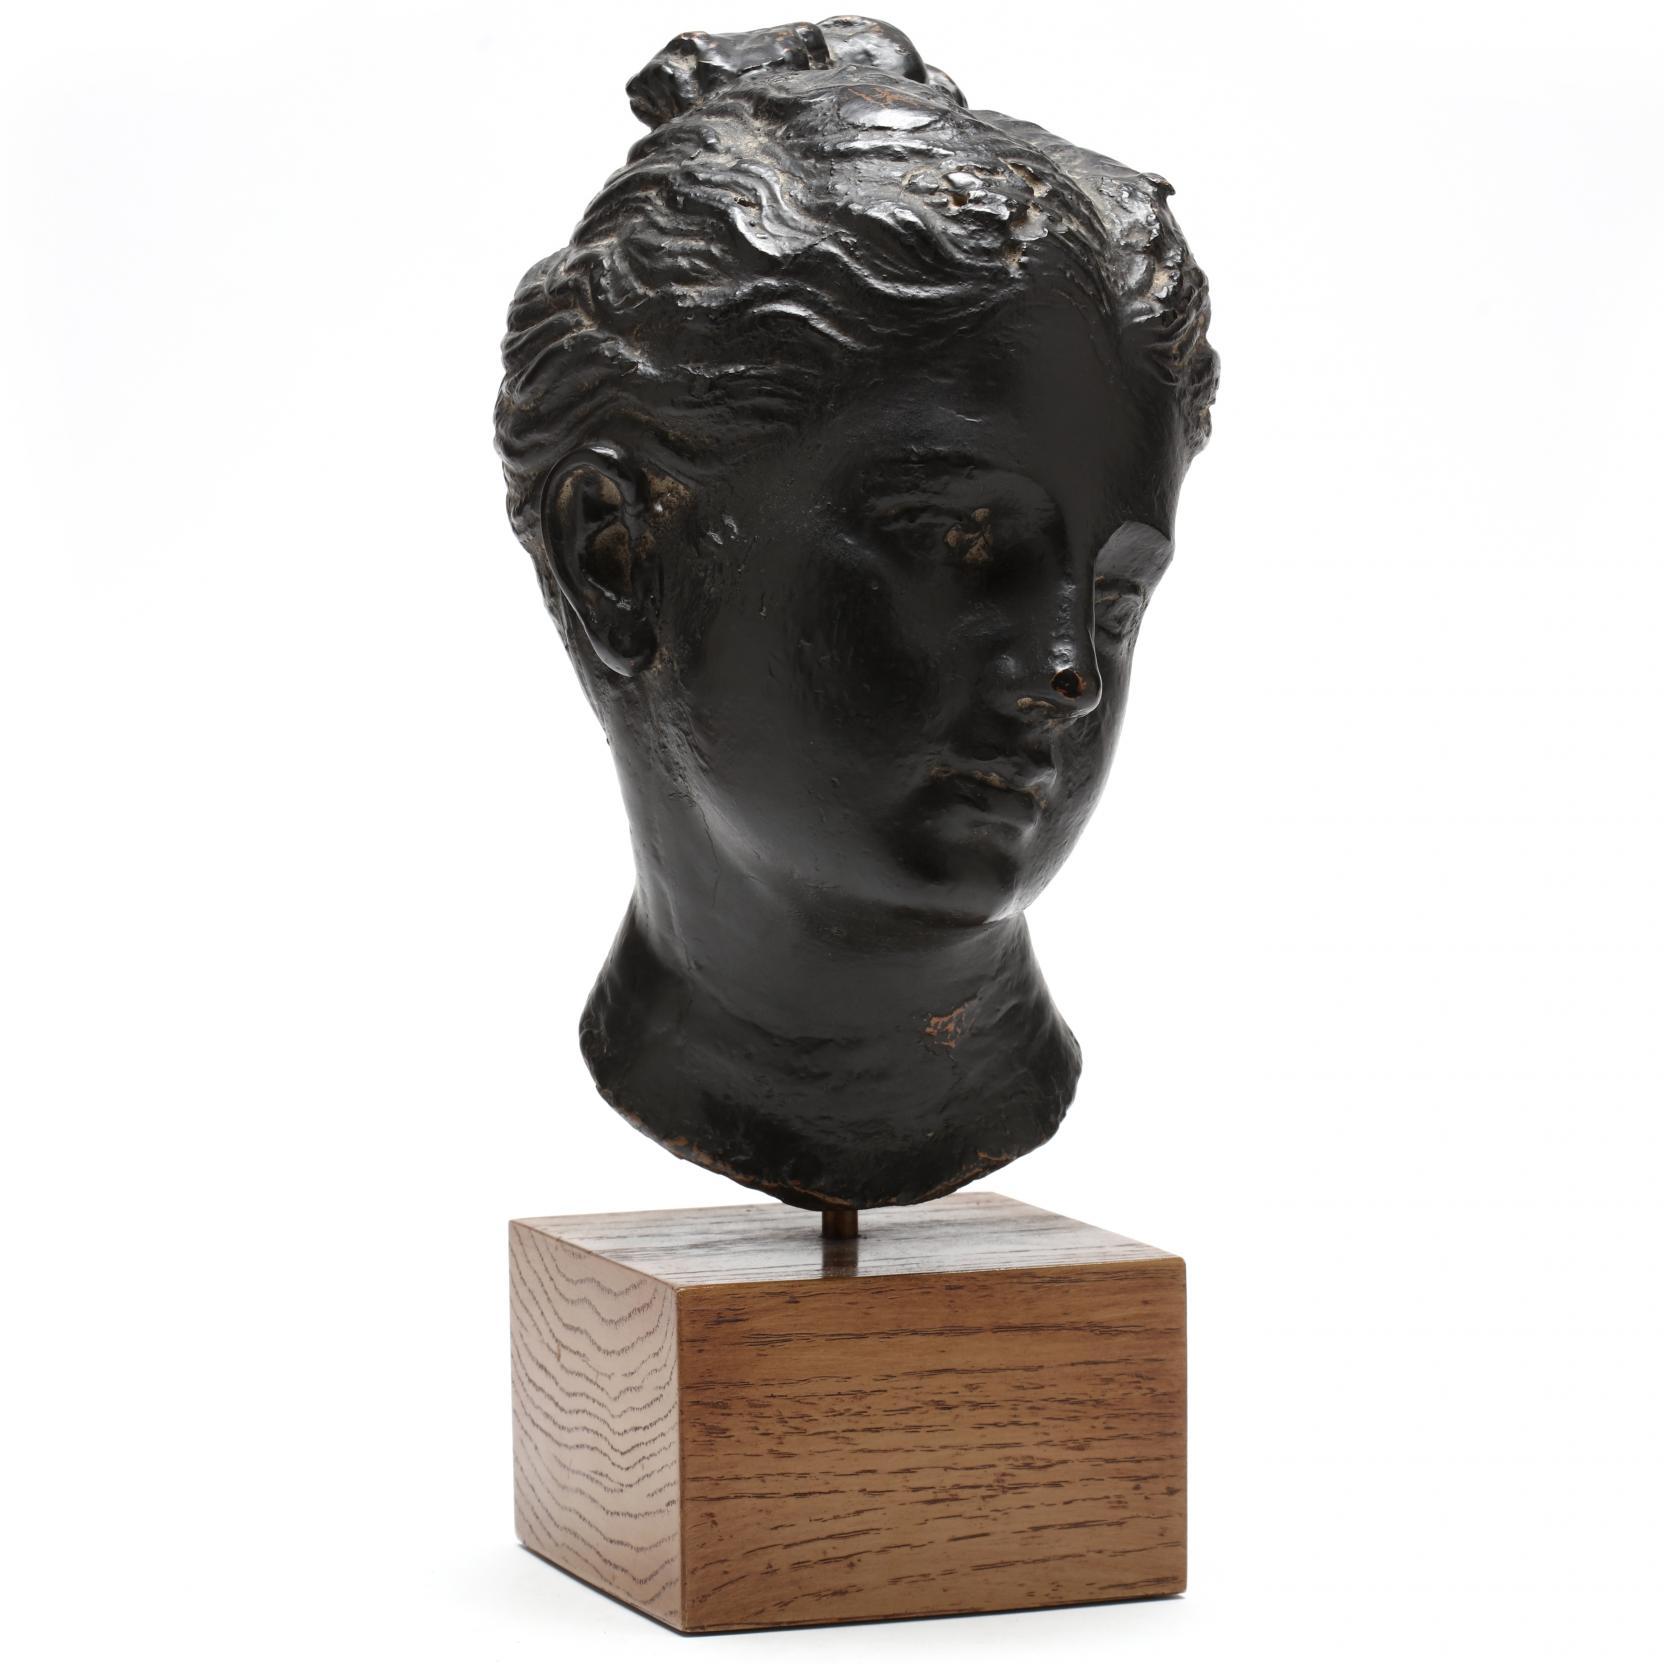 metropolitan-museum-of-art-bonded-bronze-head-of-a-woman